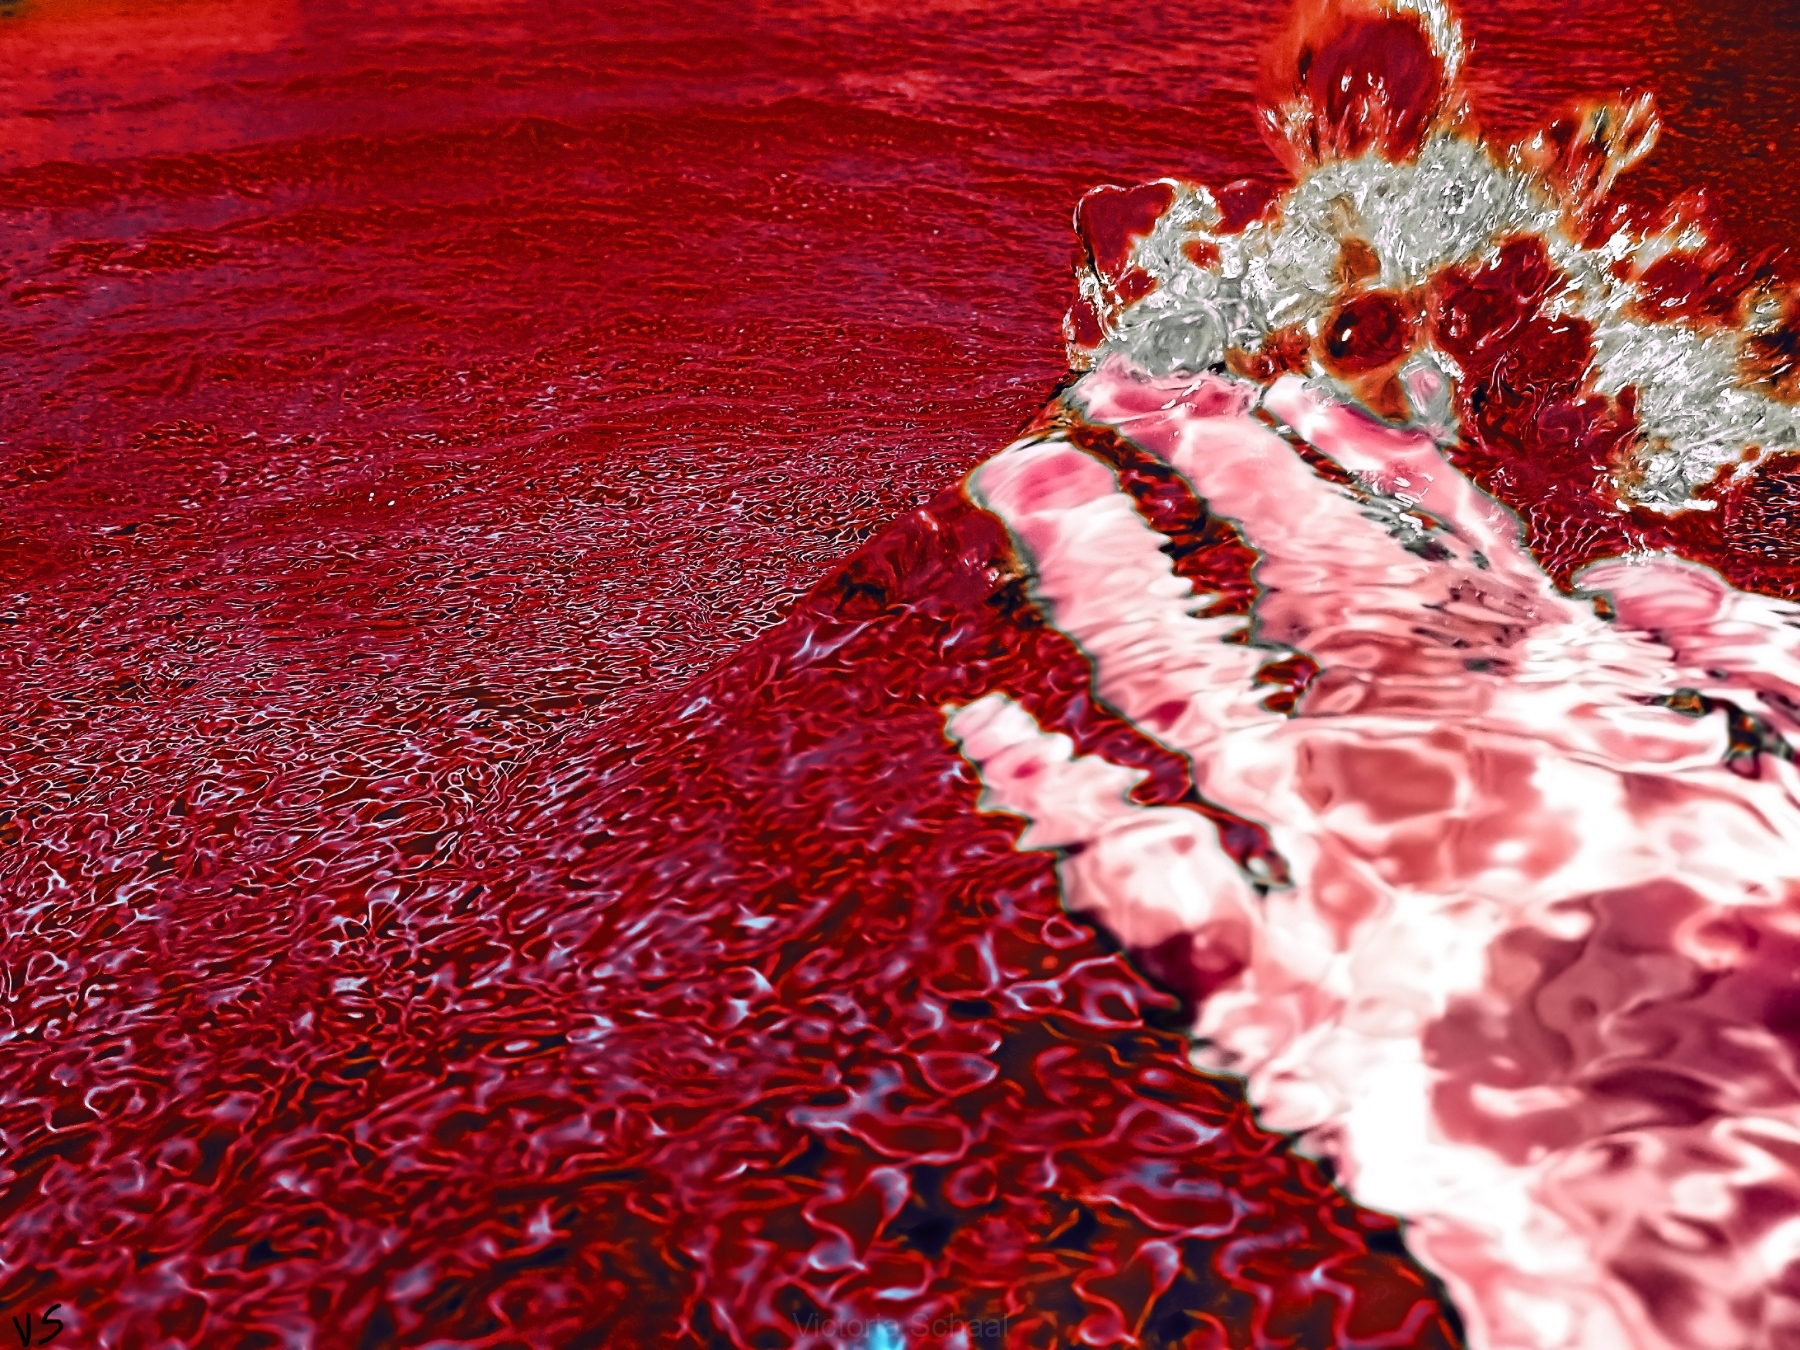 Hand under splash of blood and water